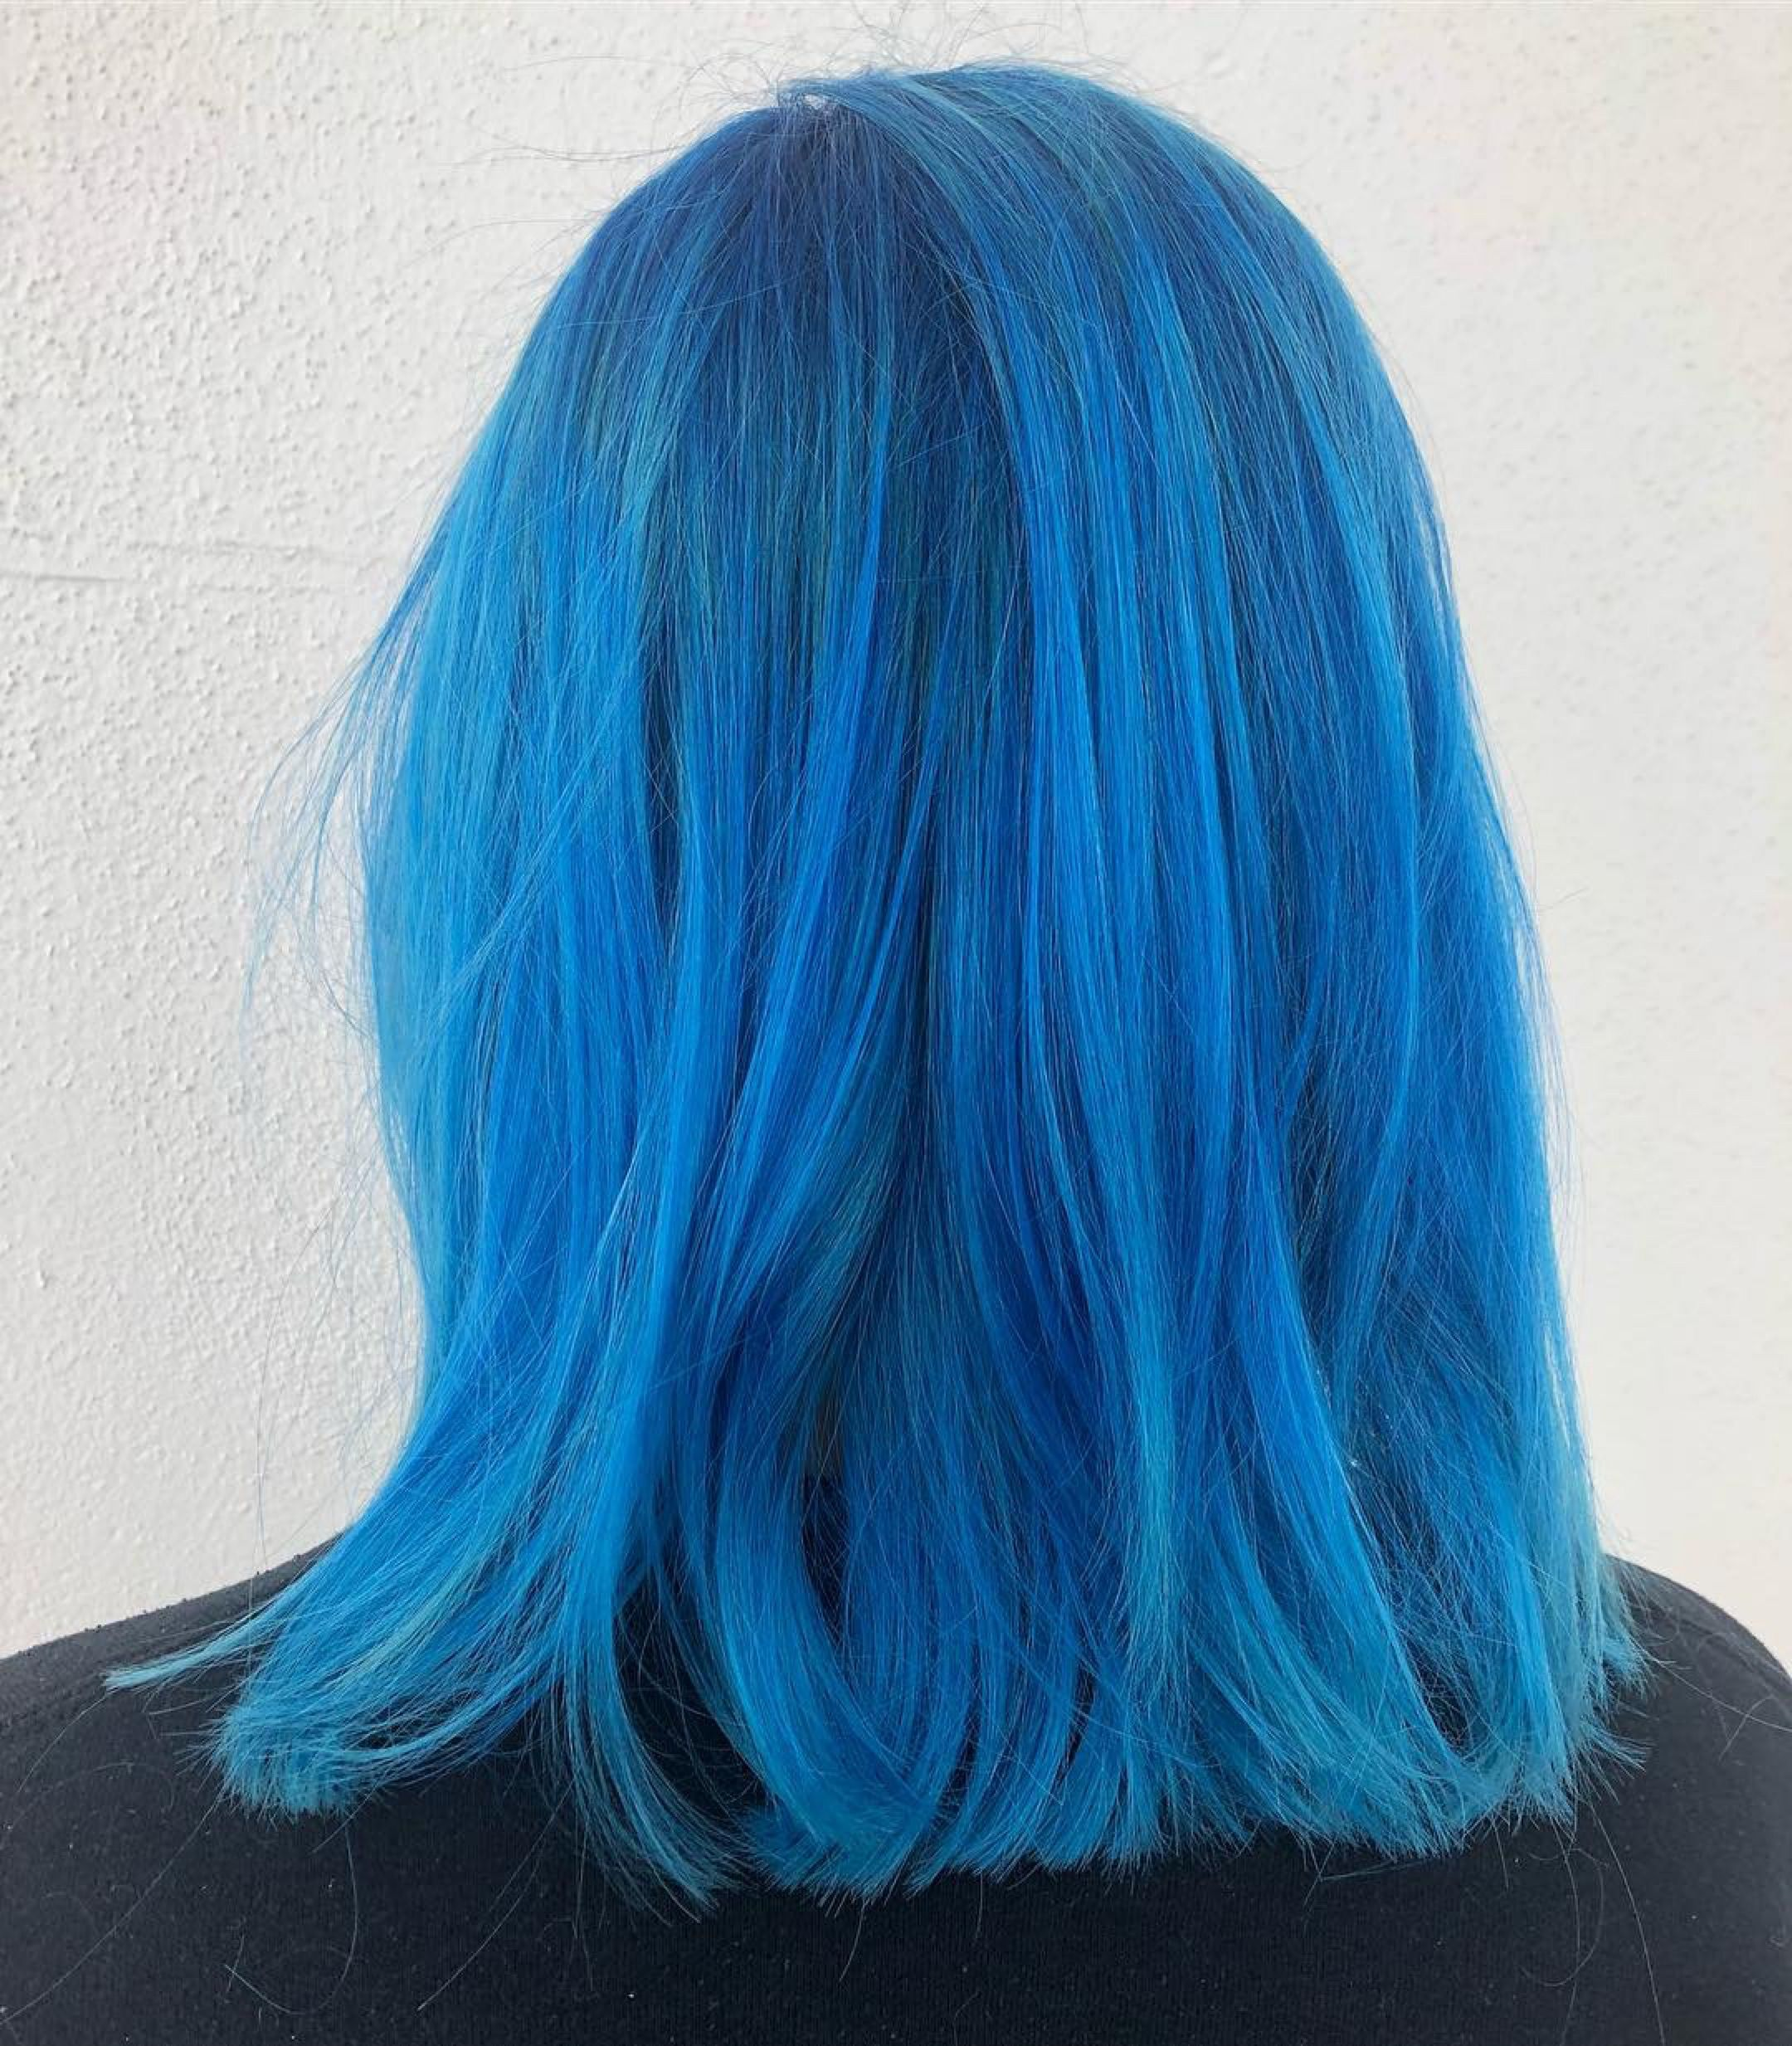 Electric Blue Hair | 2019 Hair Trends